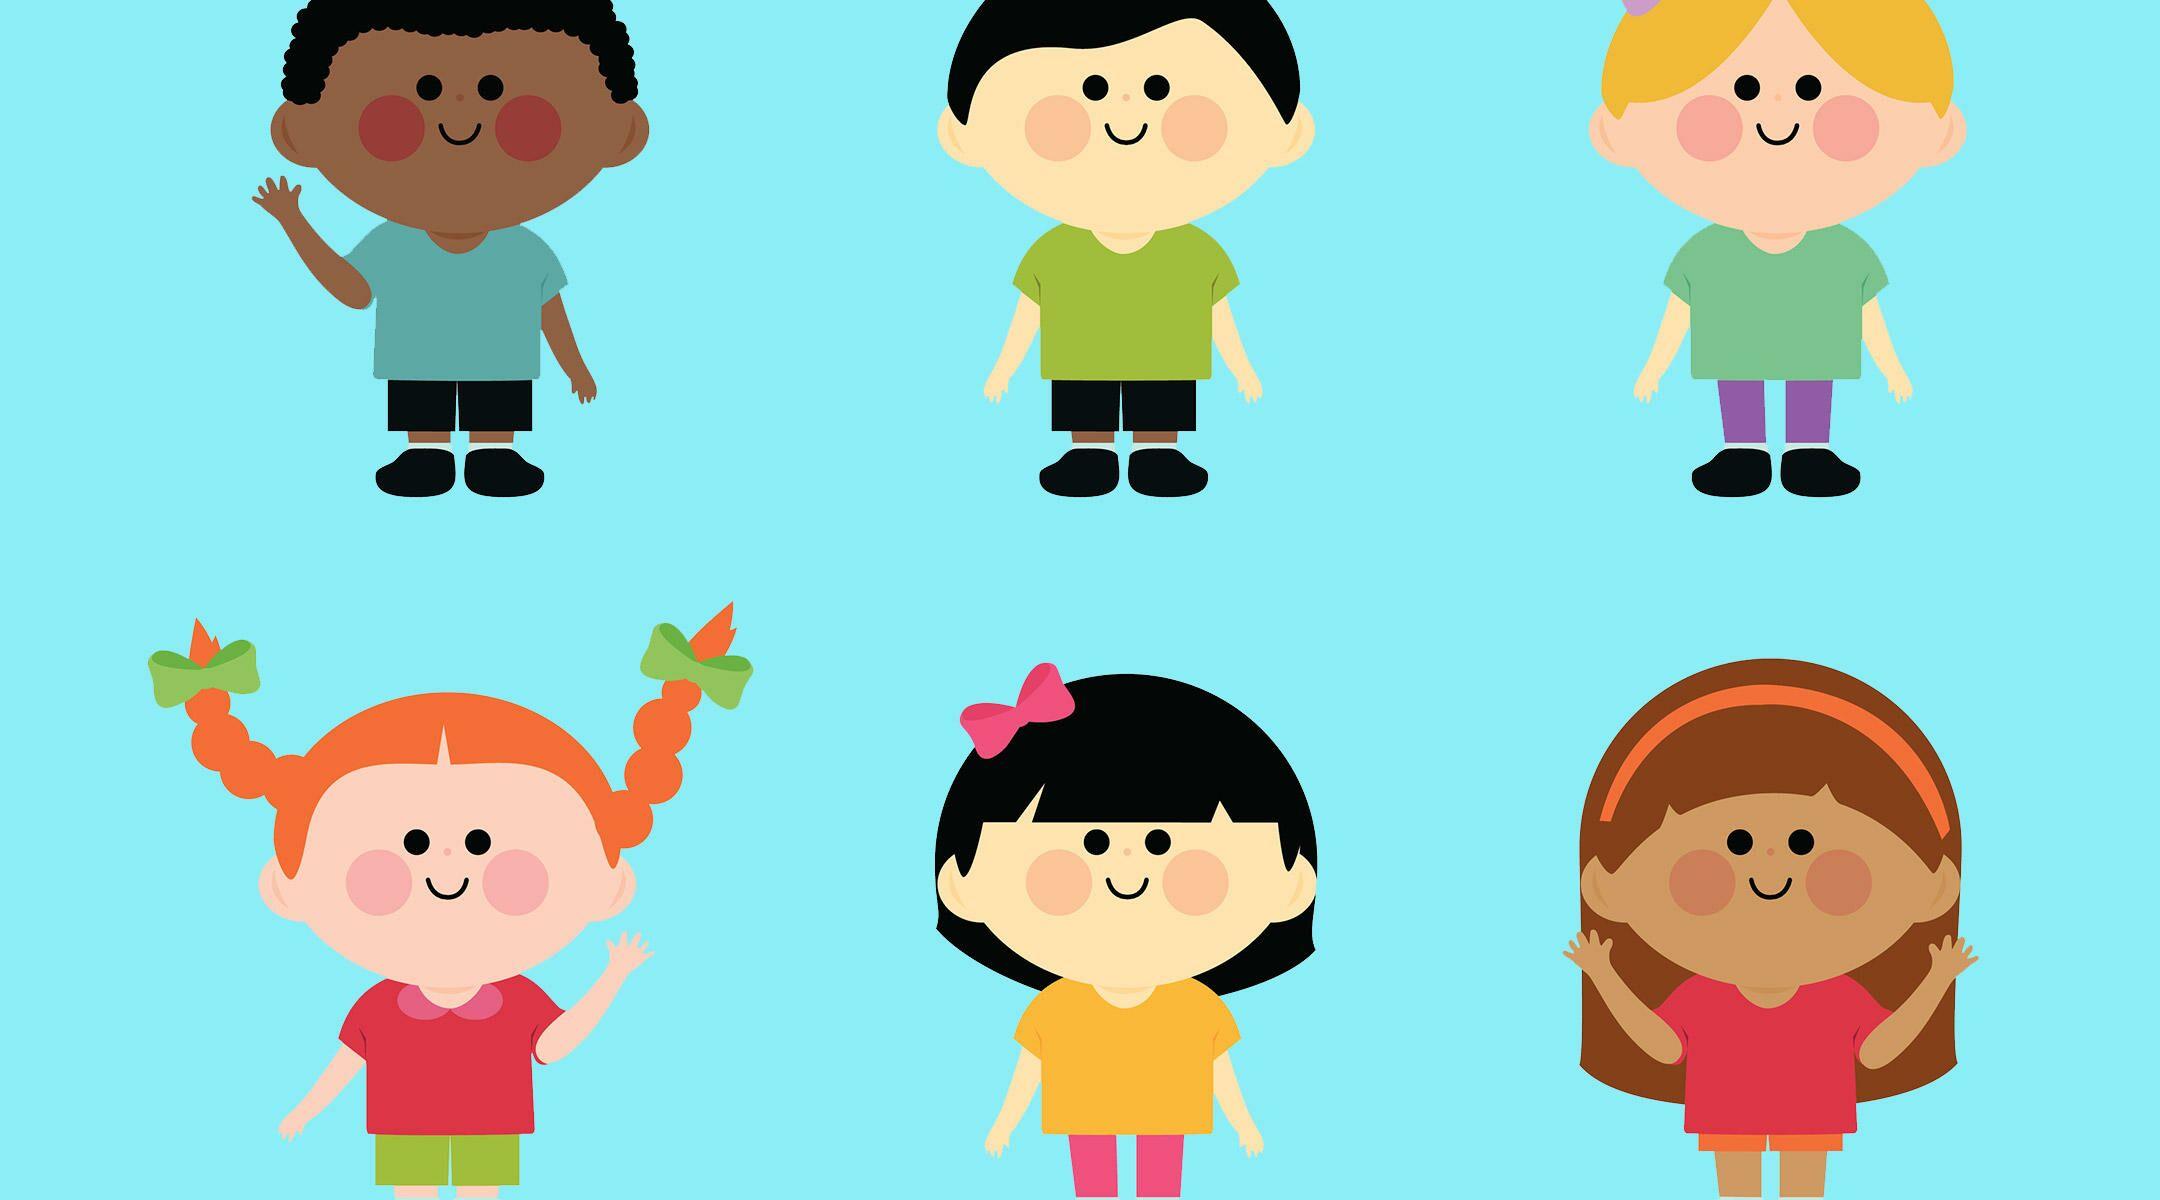 happy illustrated diverse kids together